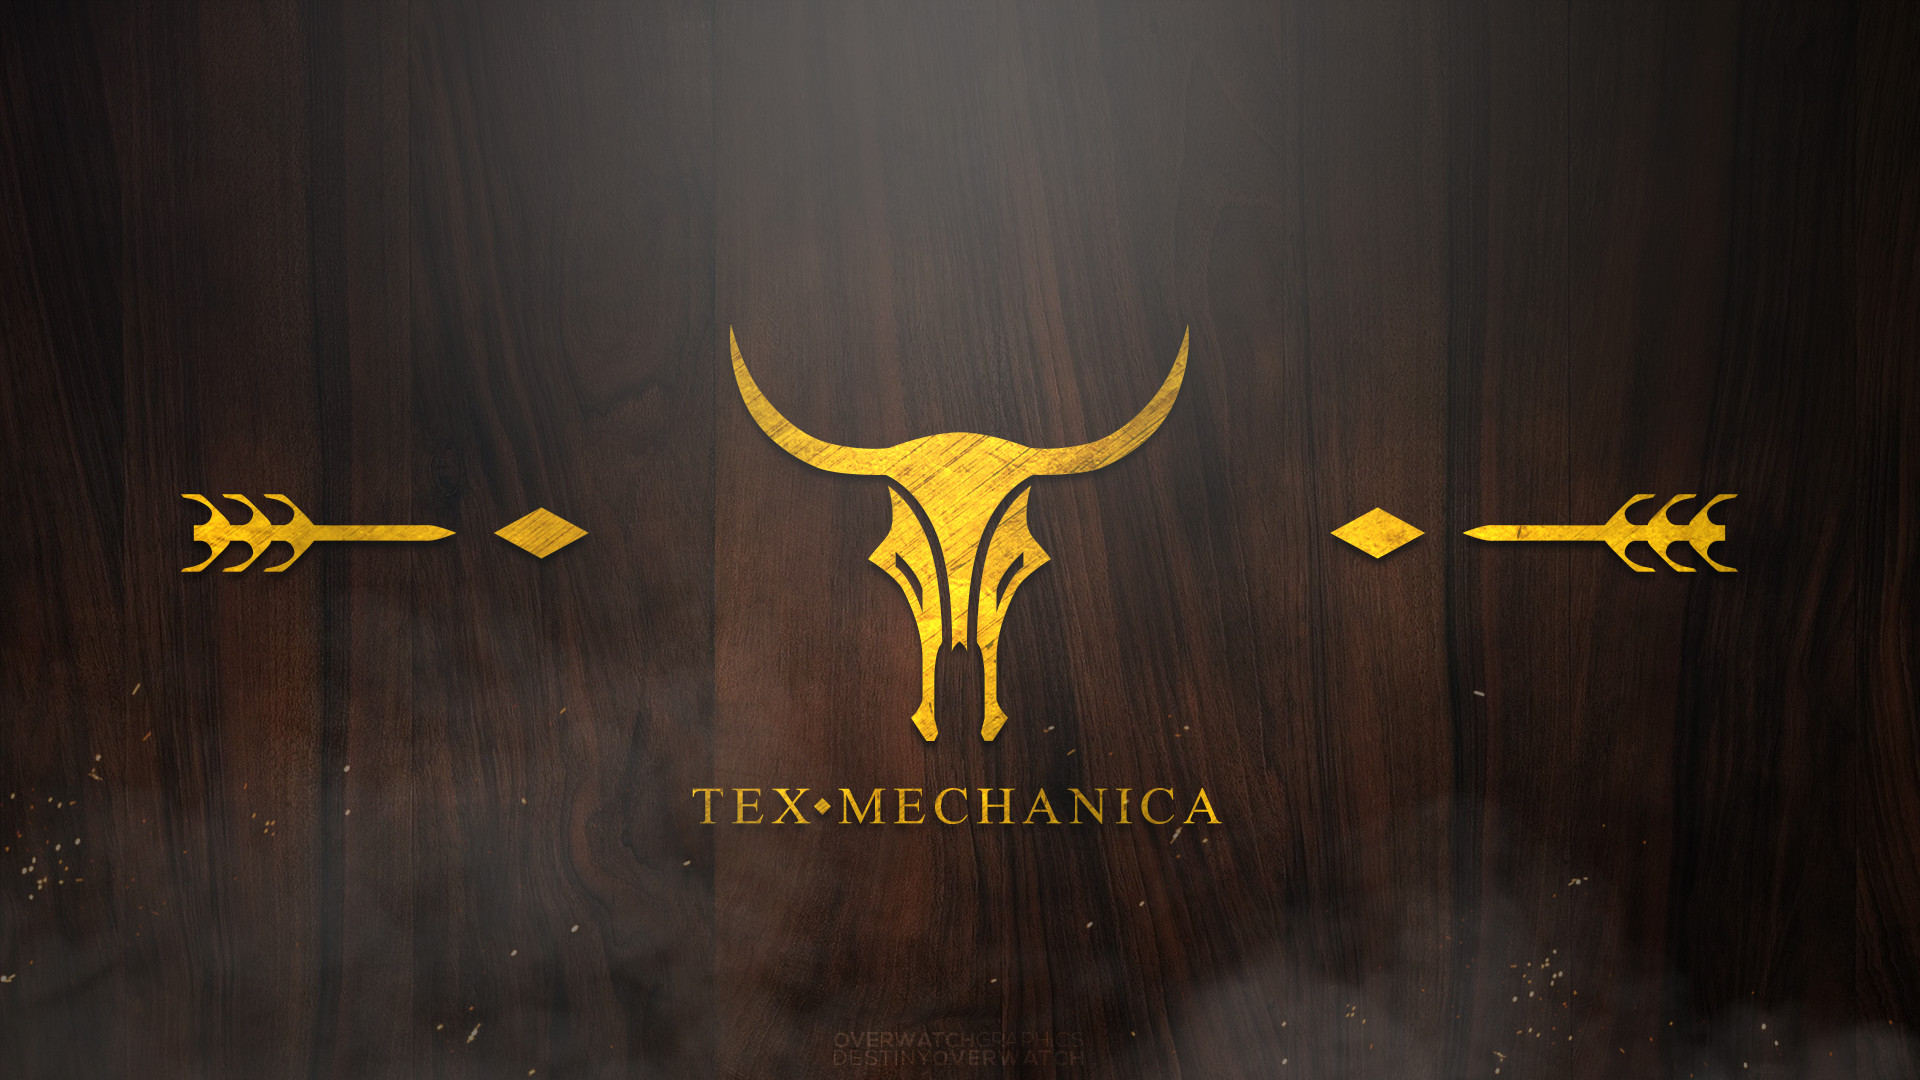 … OverwatchGraphics Destiny – Tex Mechanica Wallpaper (Dust) by  OverwatchGraphics